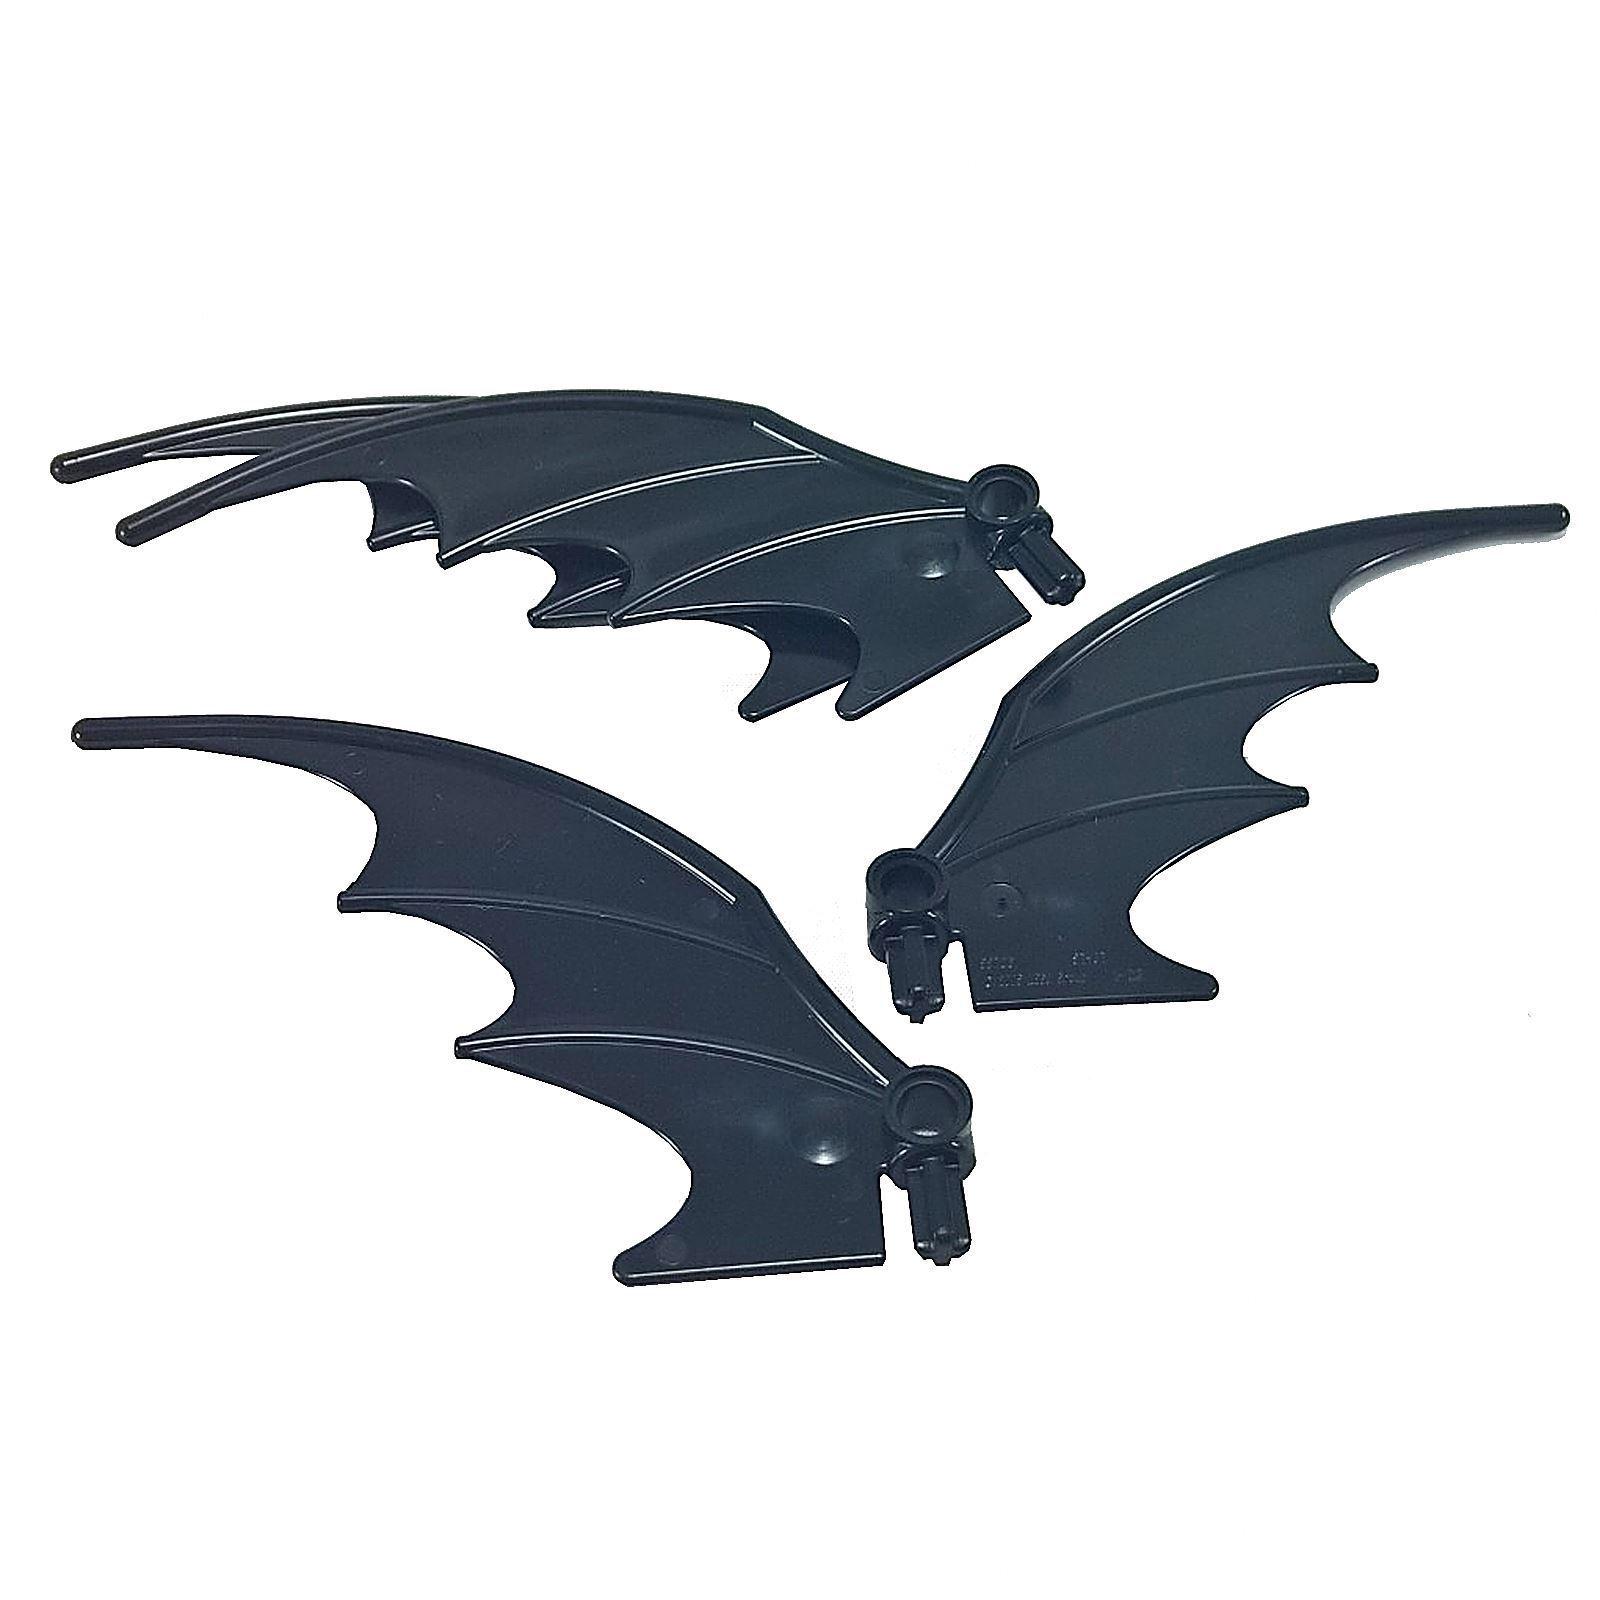 Lego Lot of 1 Pair of Dark gray Dragon Wings